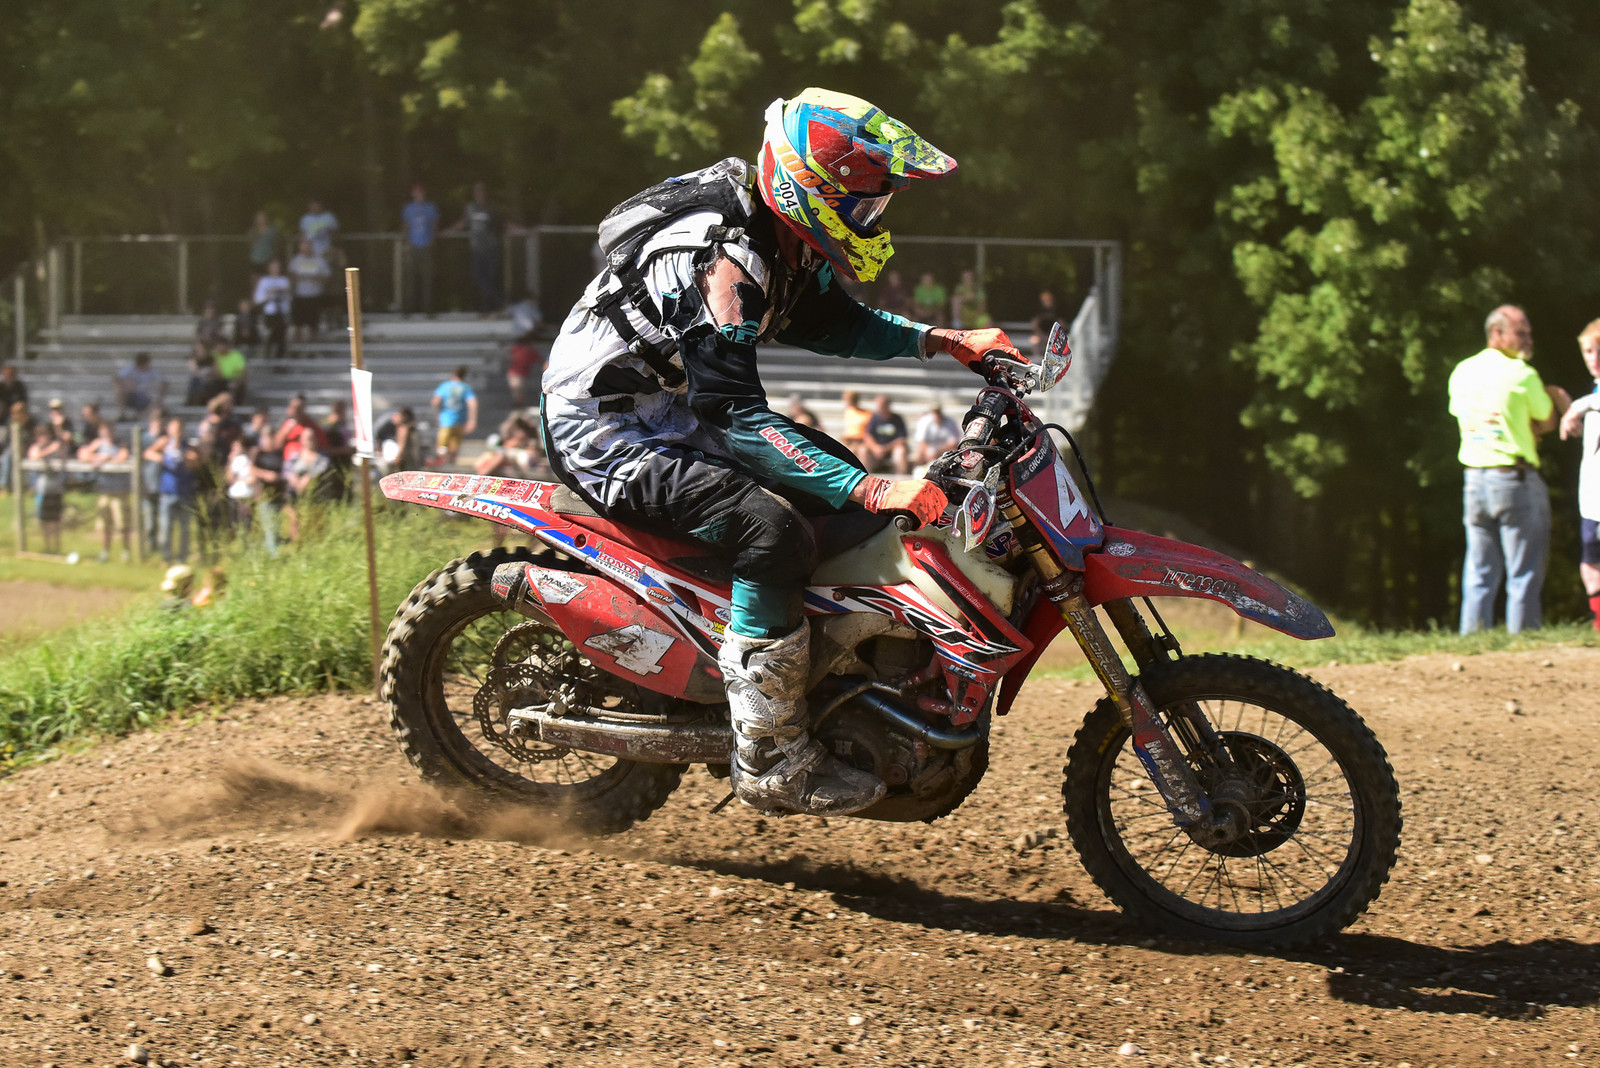 Chris Bach - Unadilla GNCC - Motocross Pictures - Vital MX